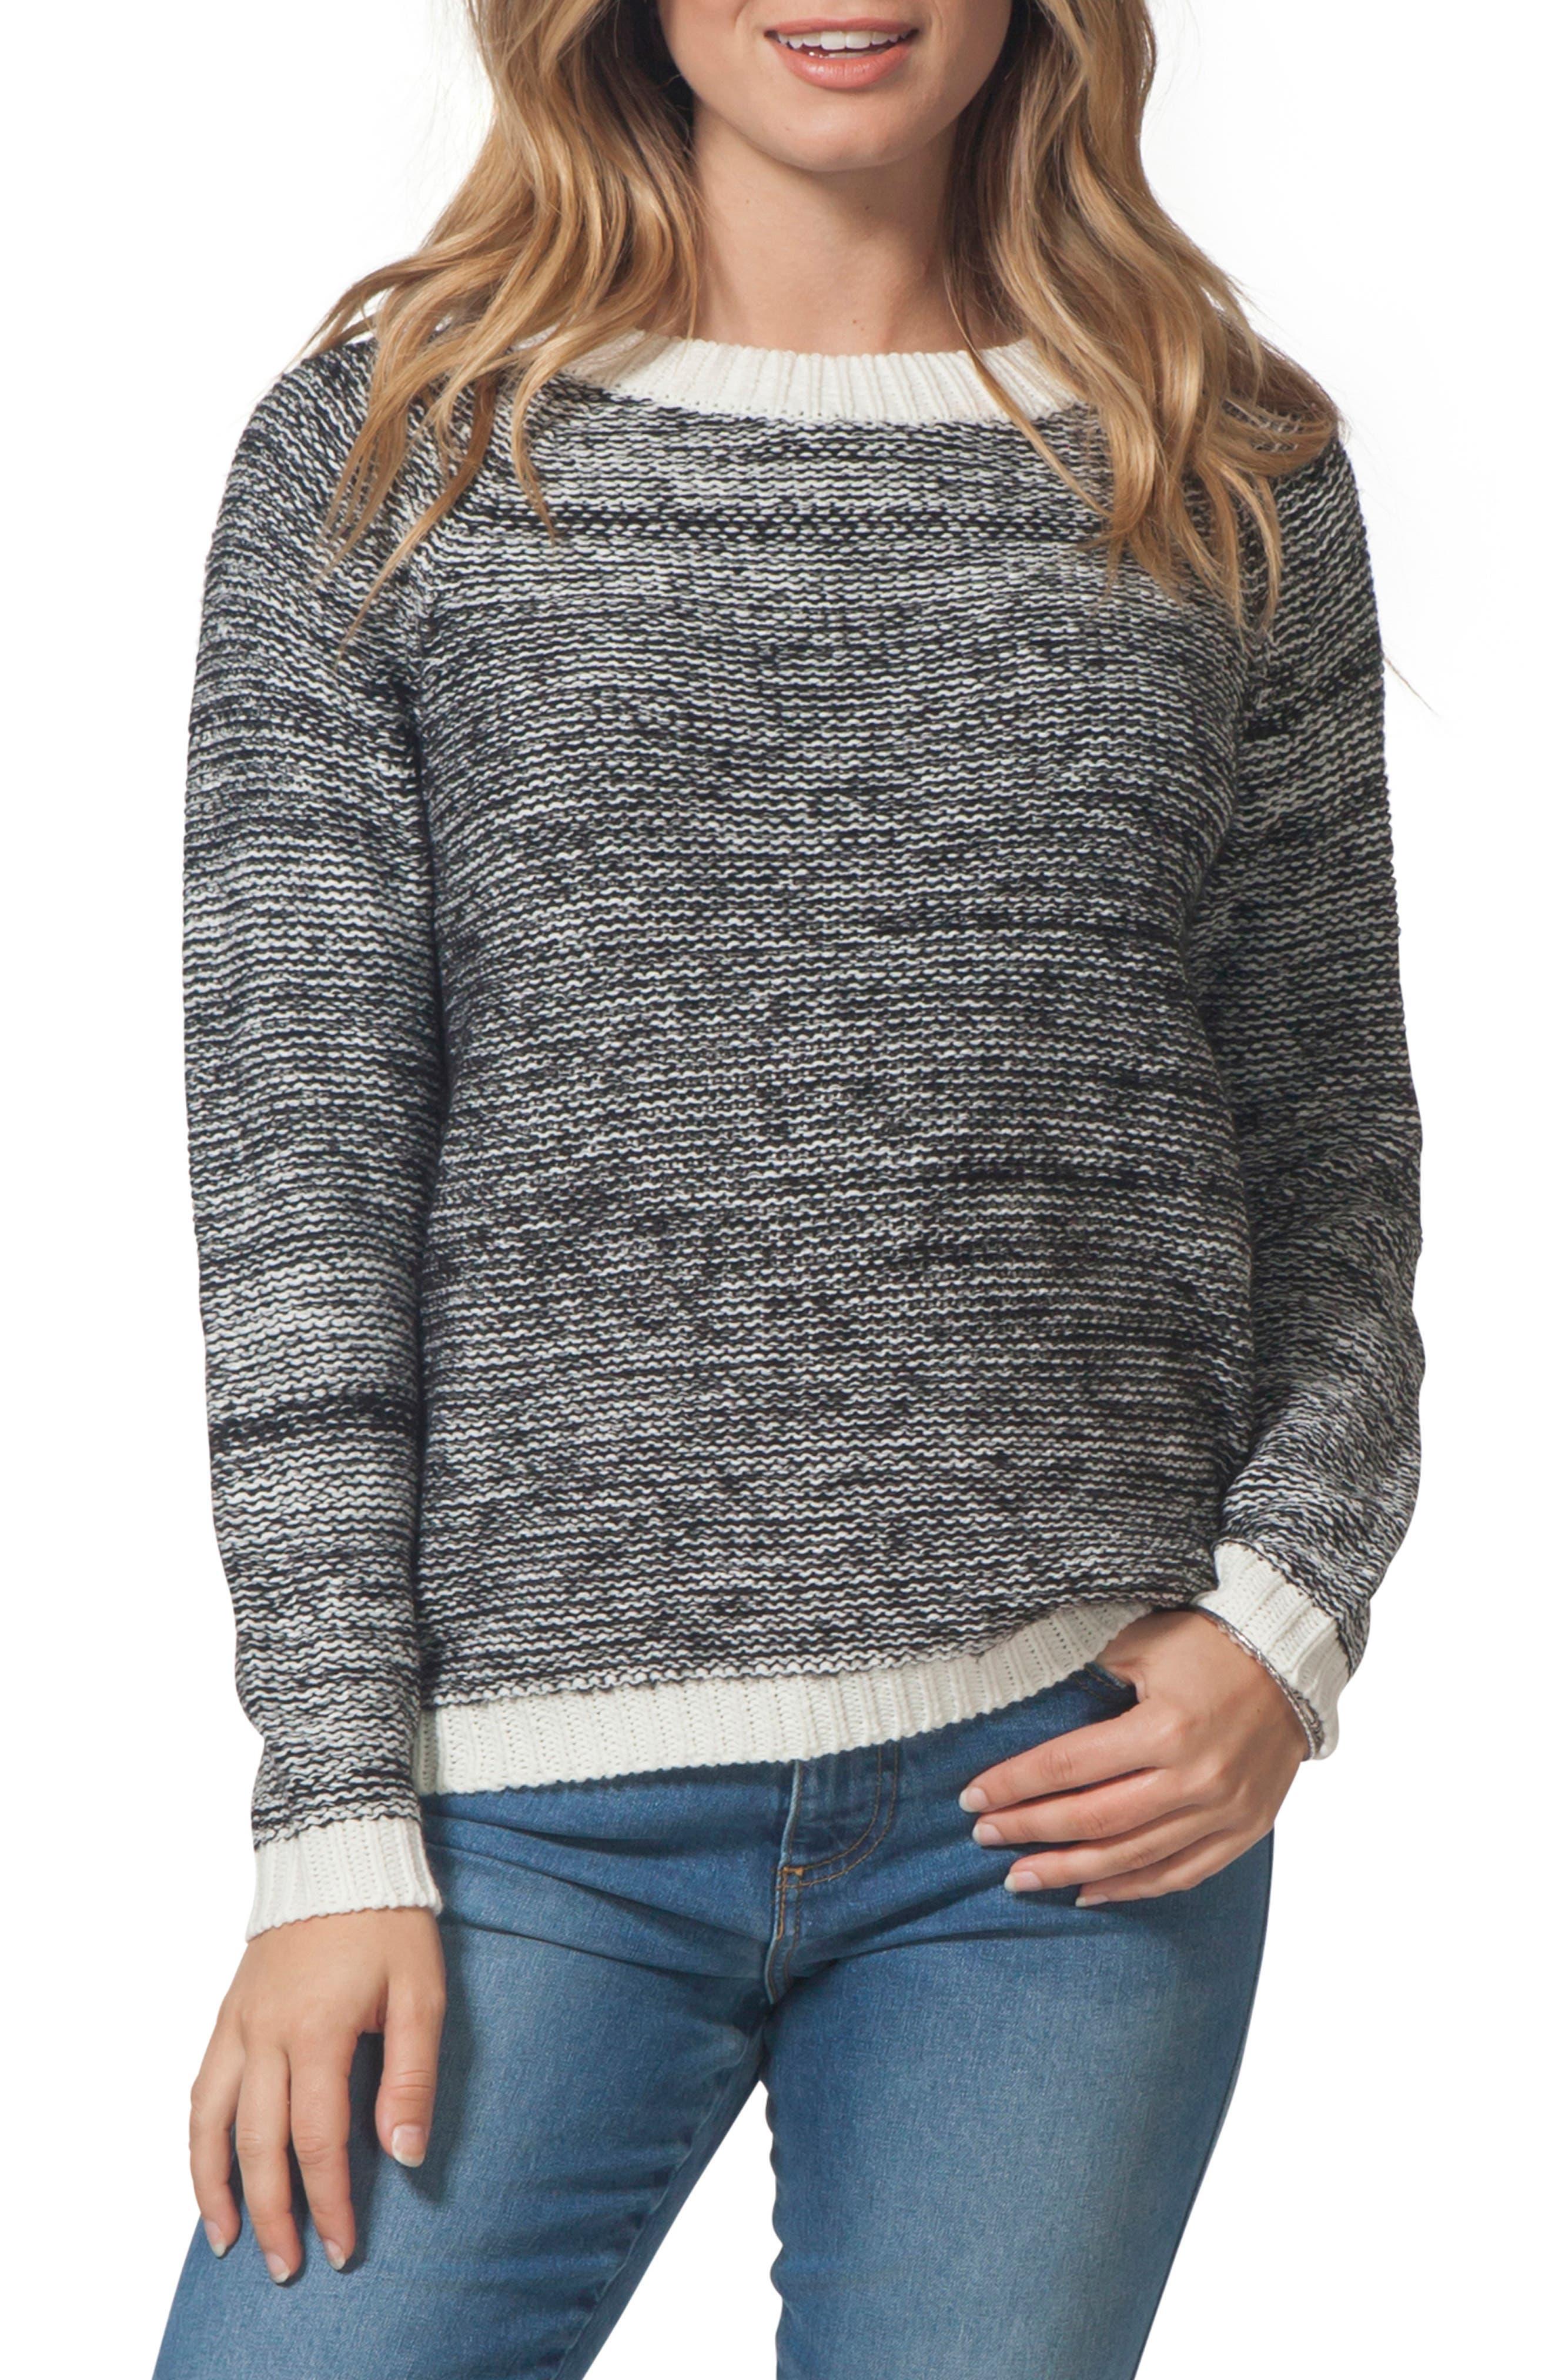 Rip Curl Beachside Crewneck Sweater